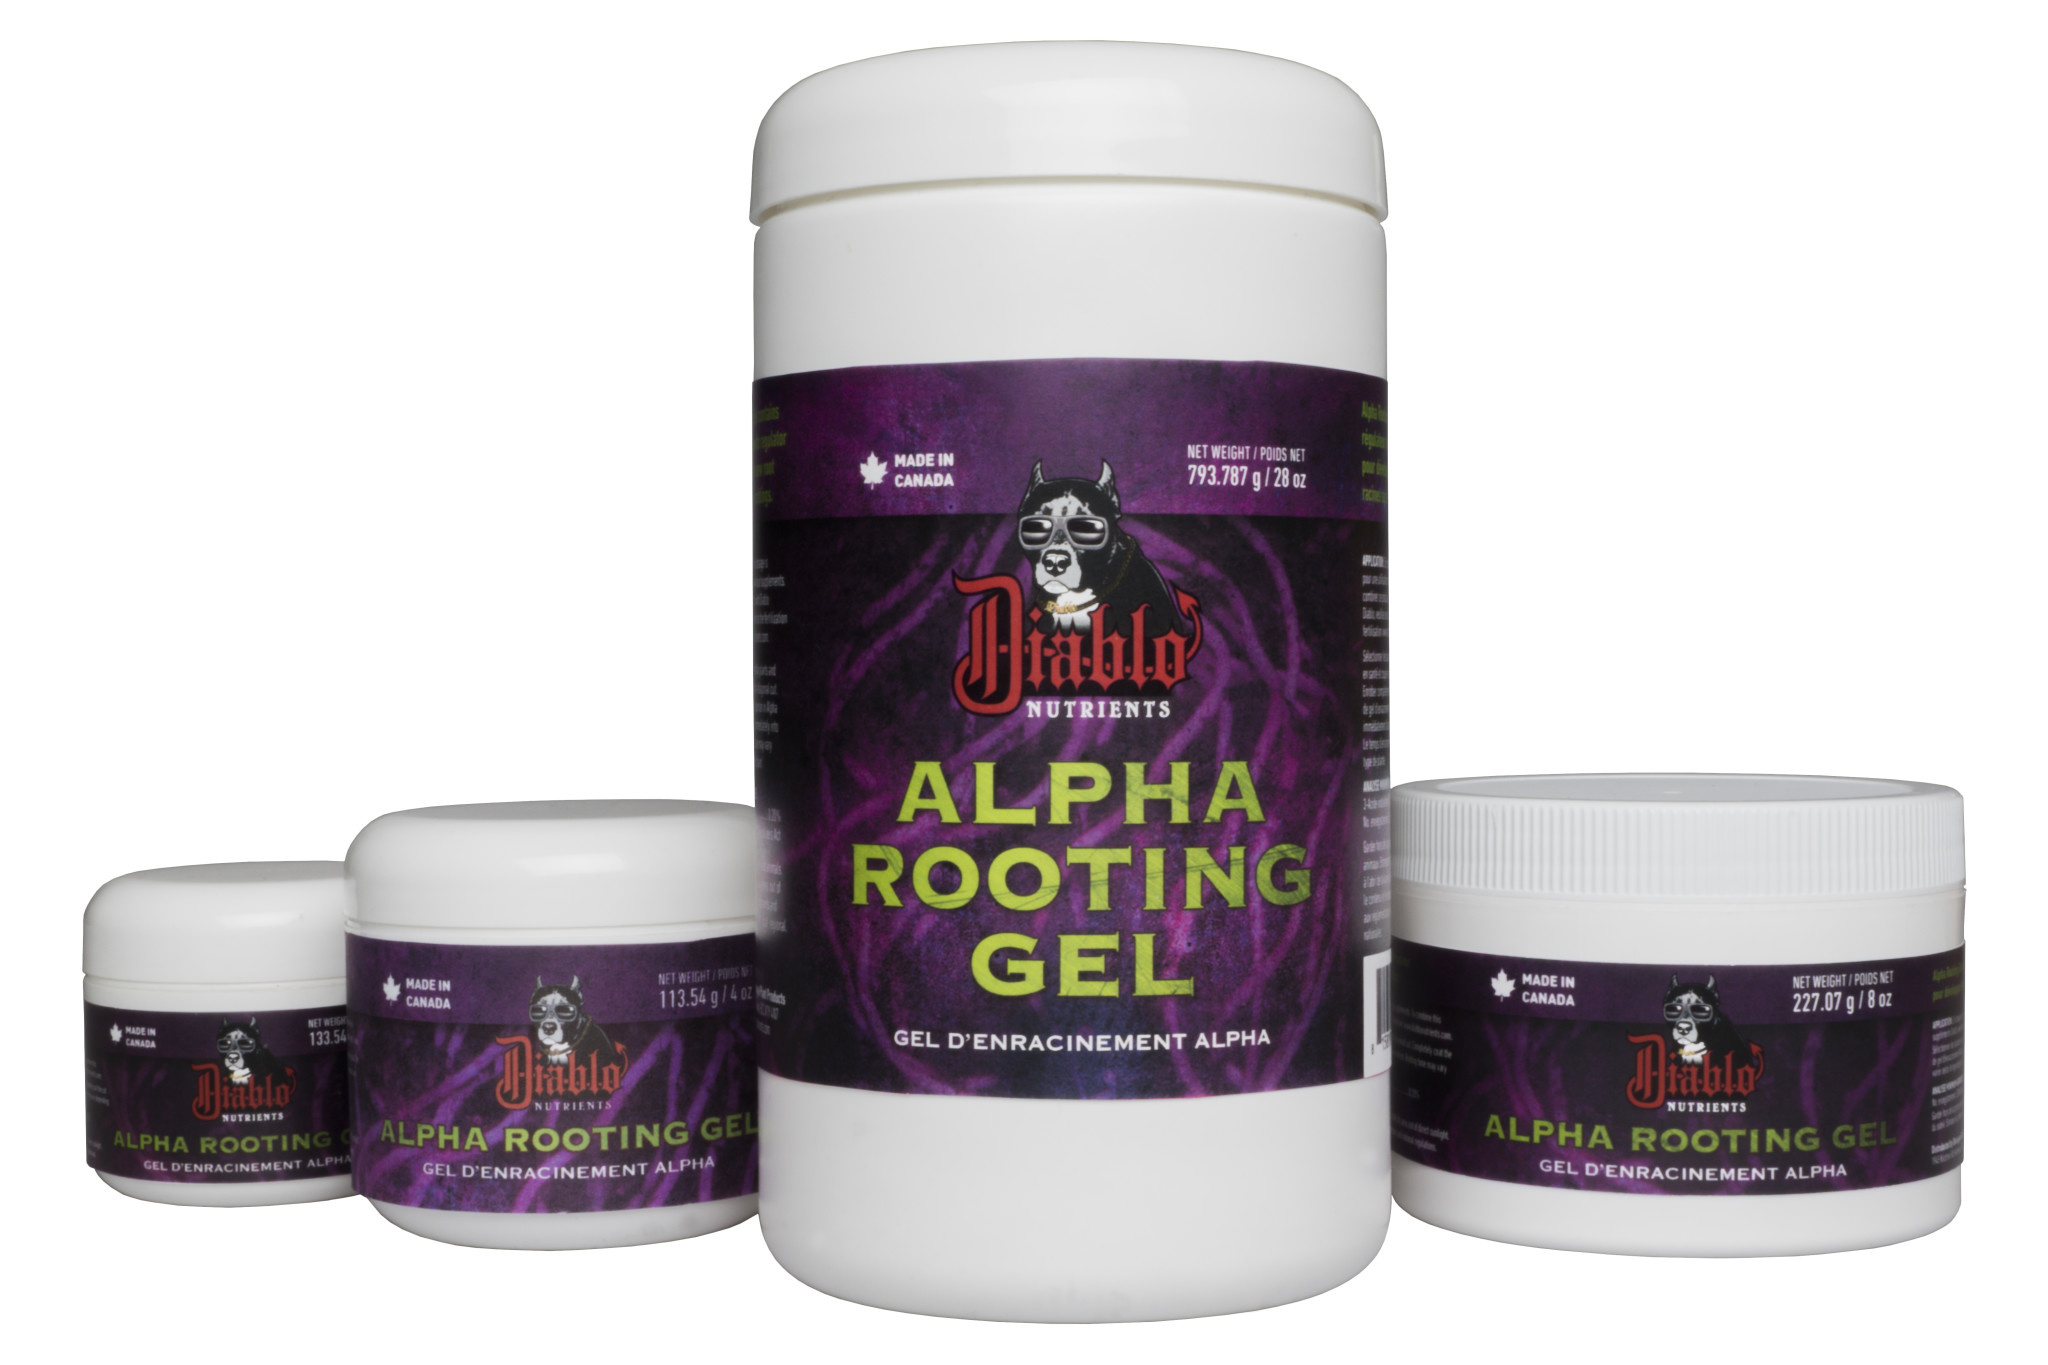 Diablo Nutrients Diablo Nutrients - Alpha Rooting Gel